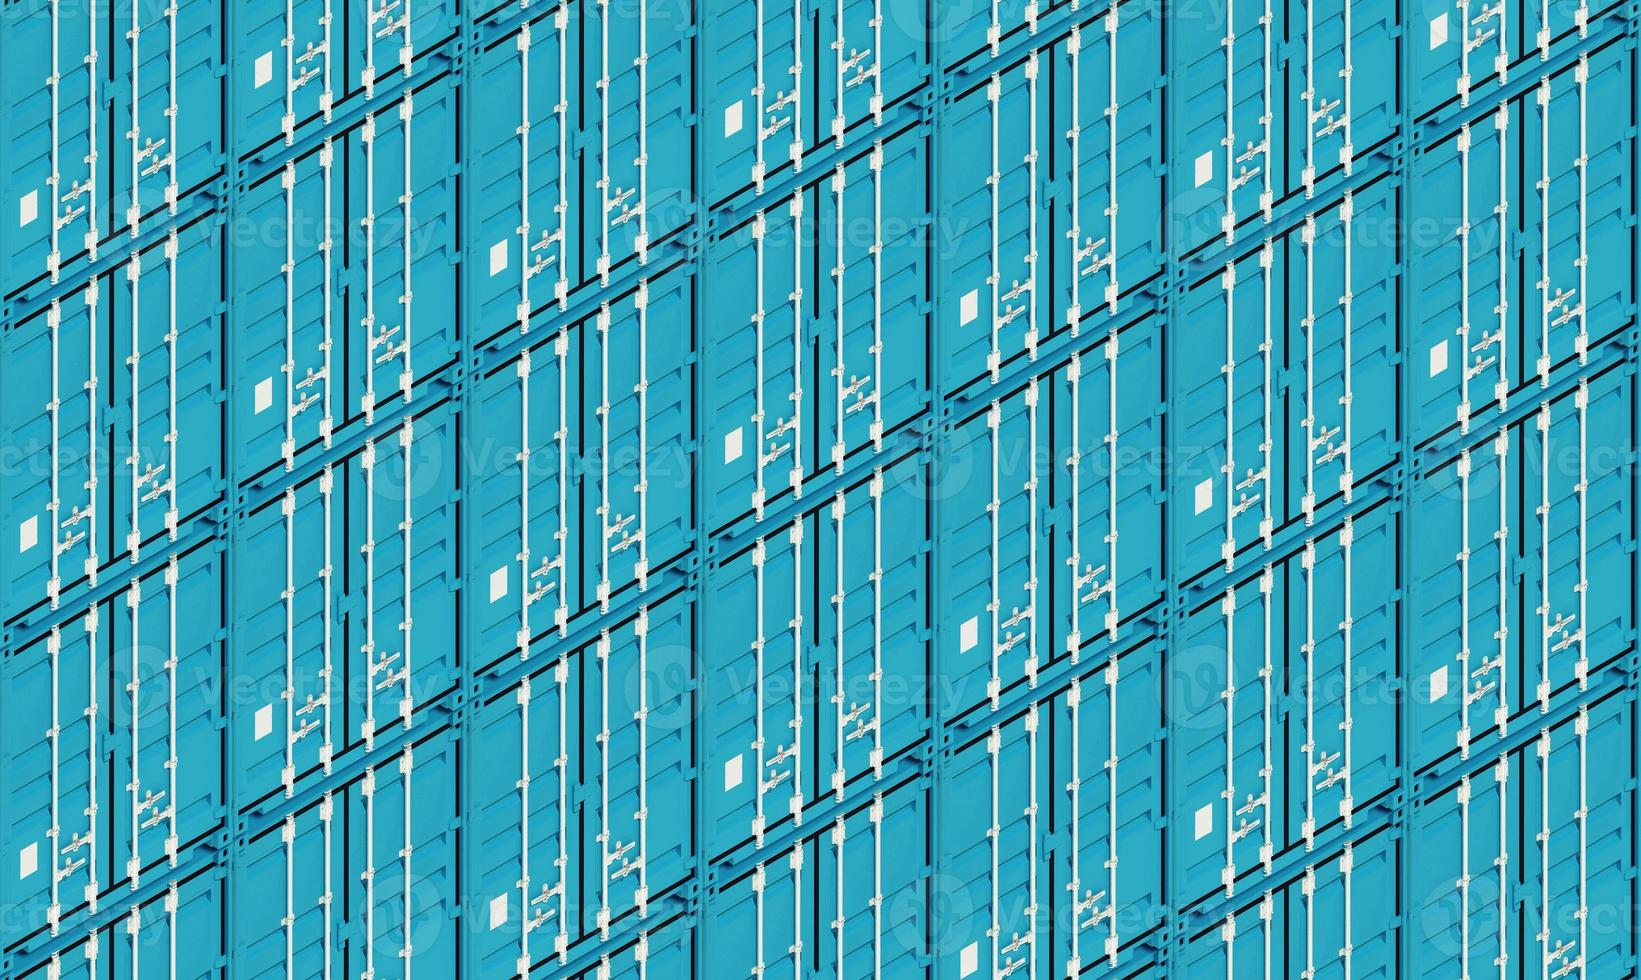 blaue Metallfrachtversandbehälter, 3d Illustration foto